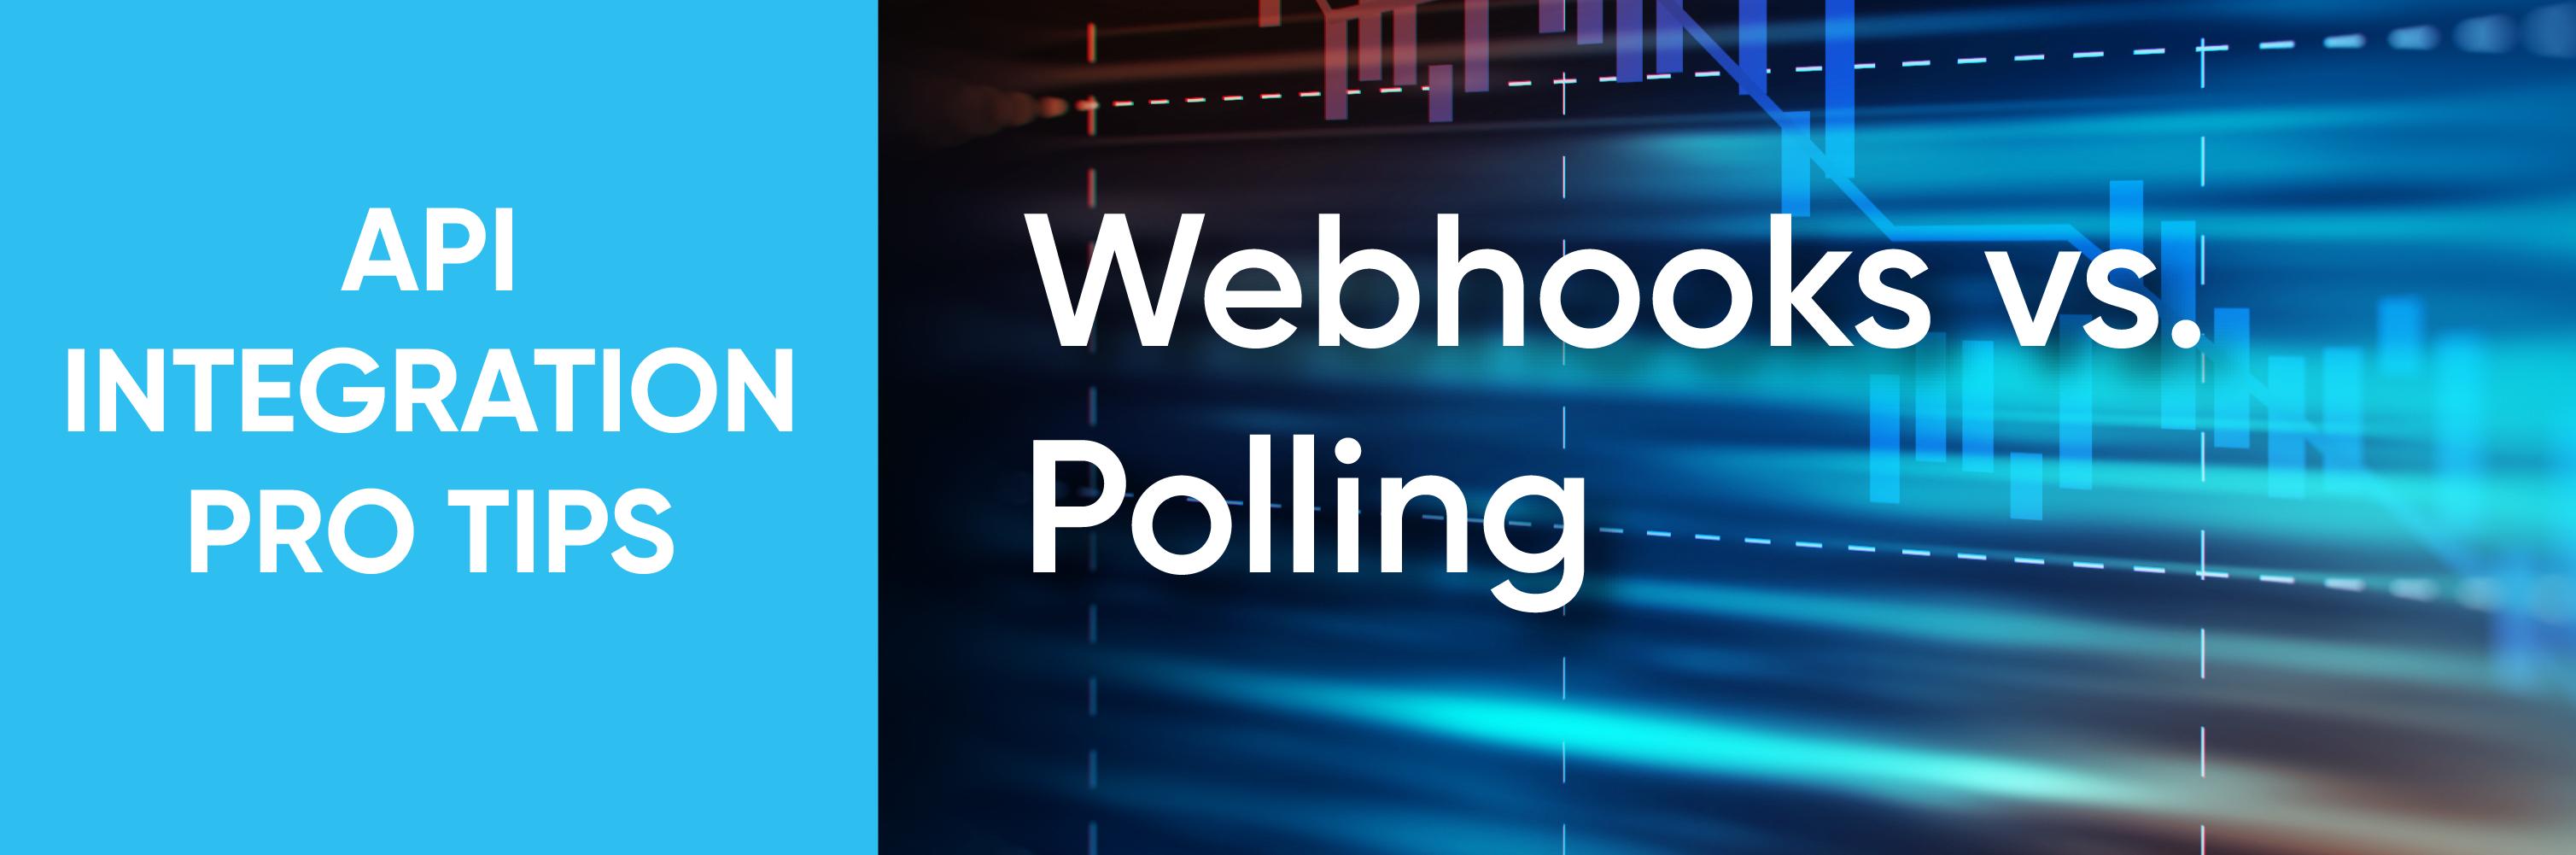 webhooks vs polling